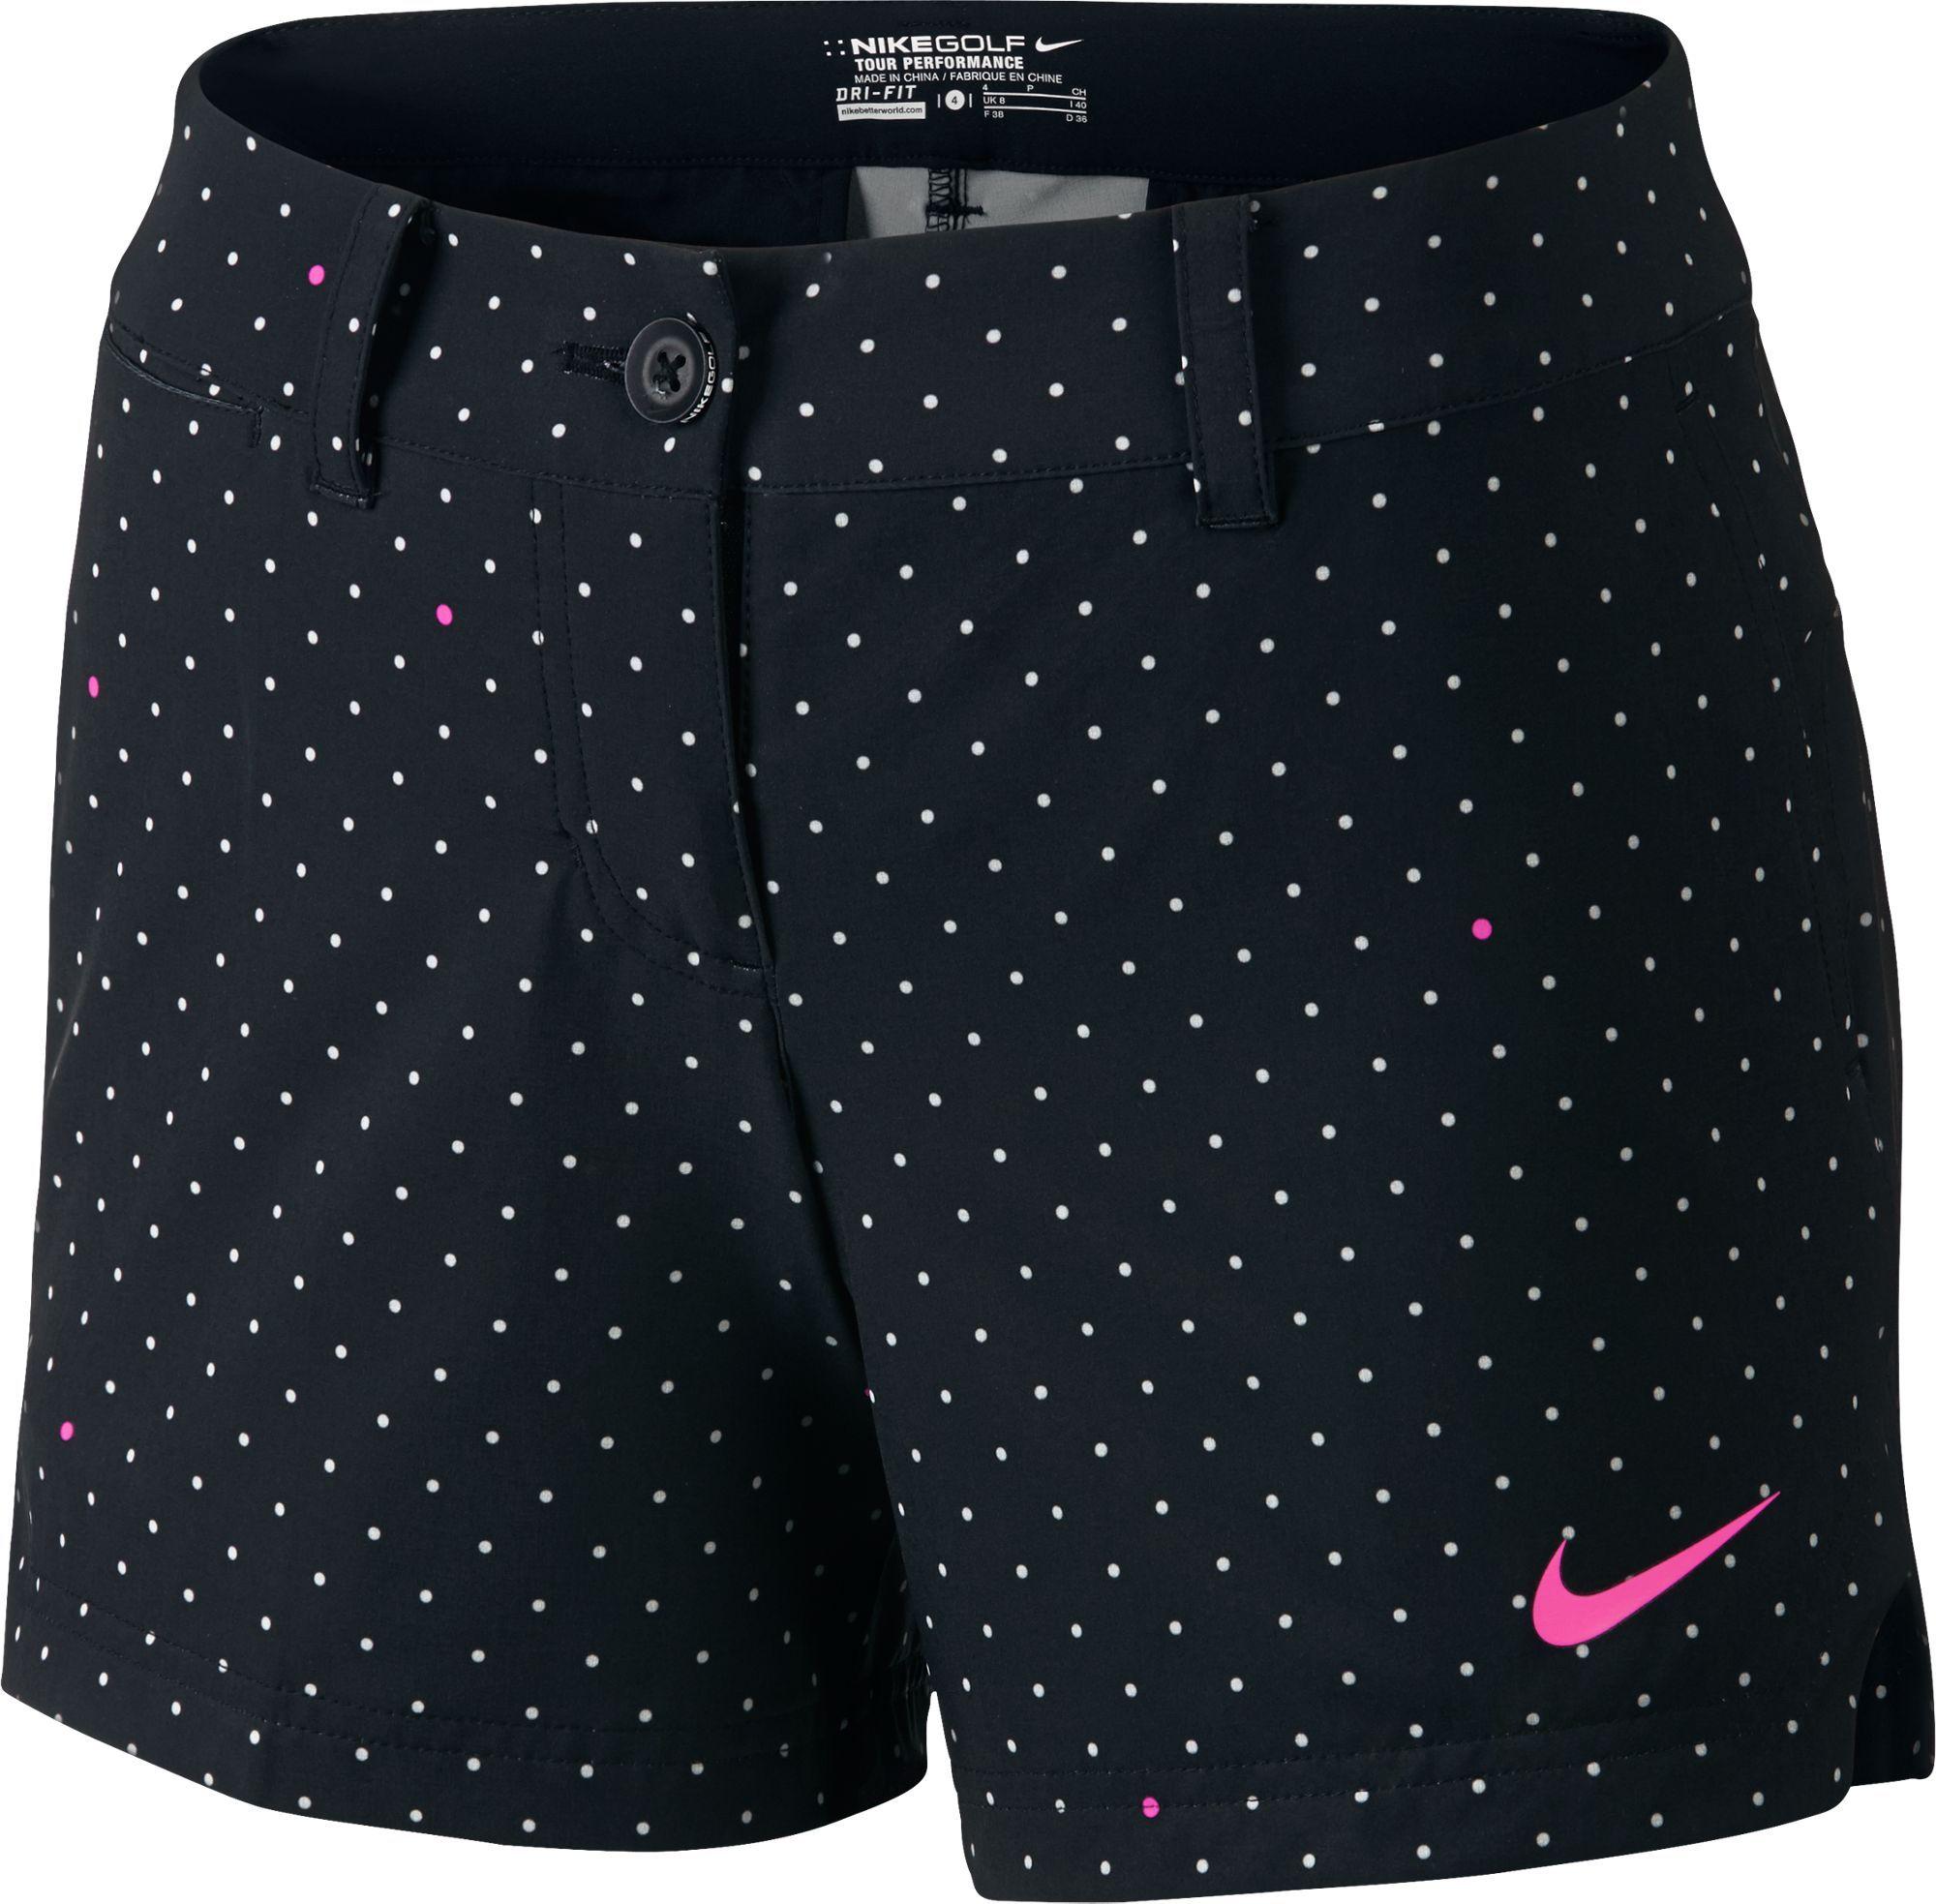 nike ladies golf shorts uk